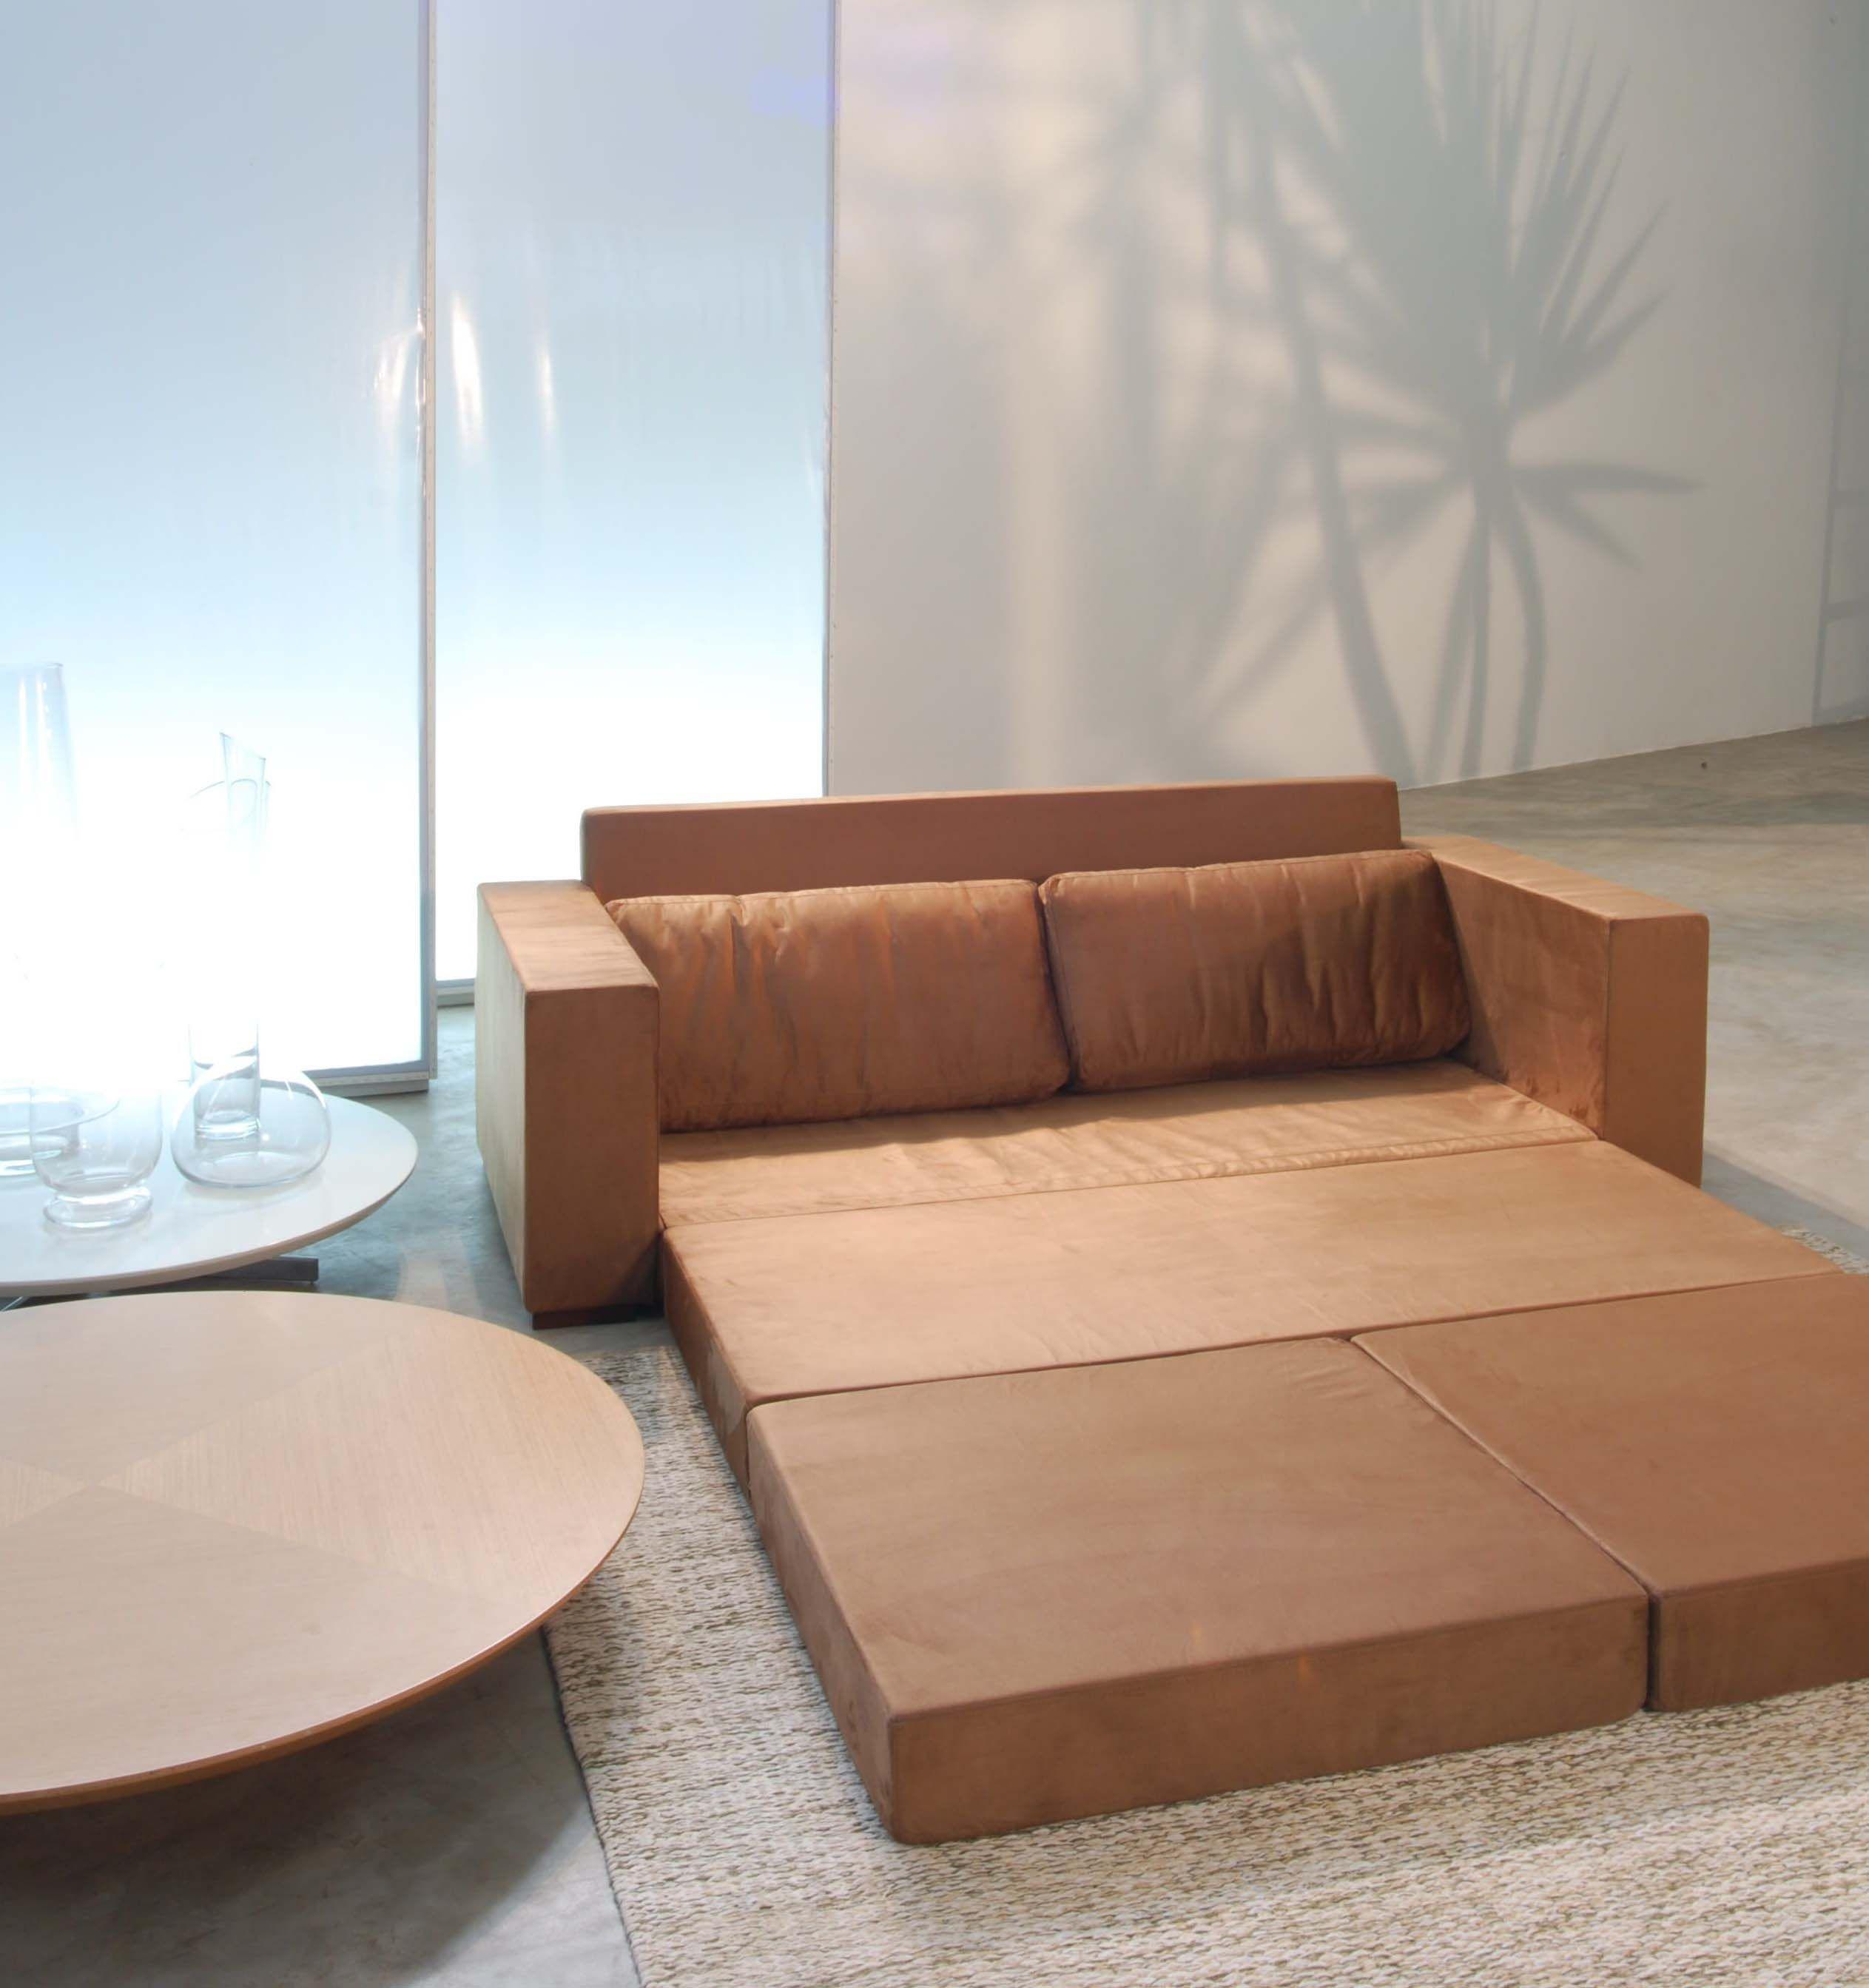 abrir sofa cama beddinge catnapper recliner sofá ases aberto sofás e chaises